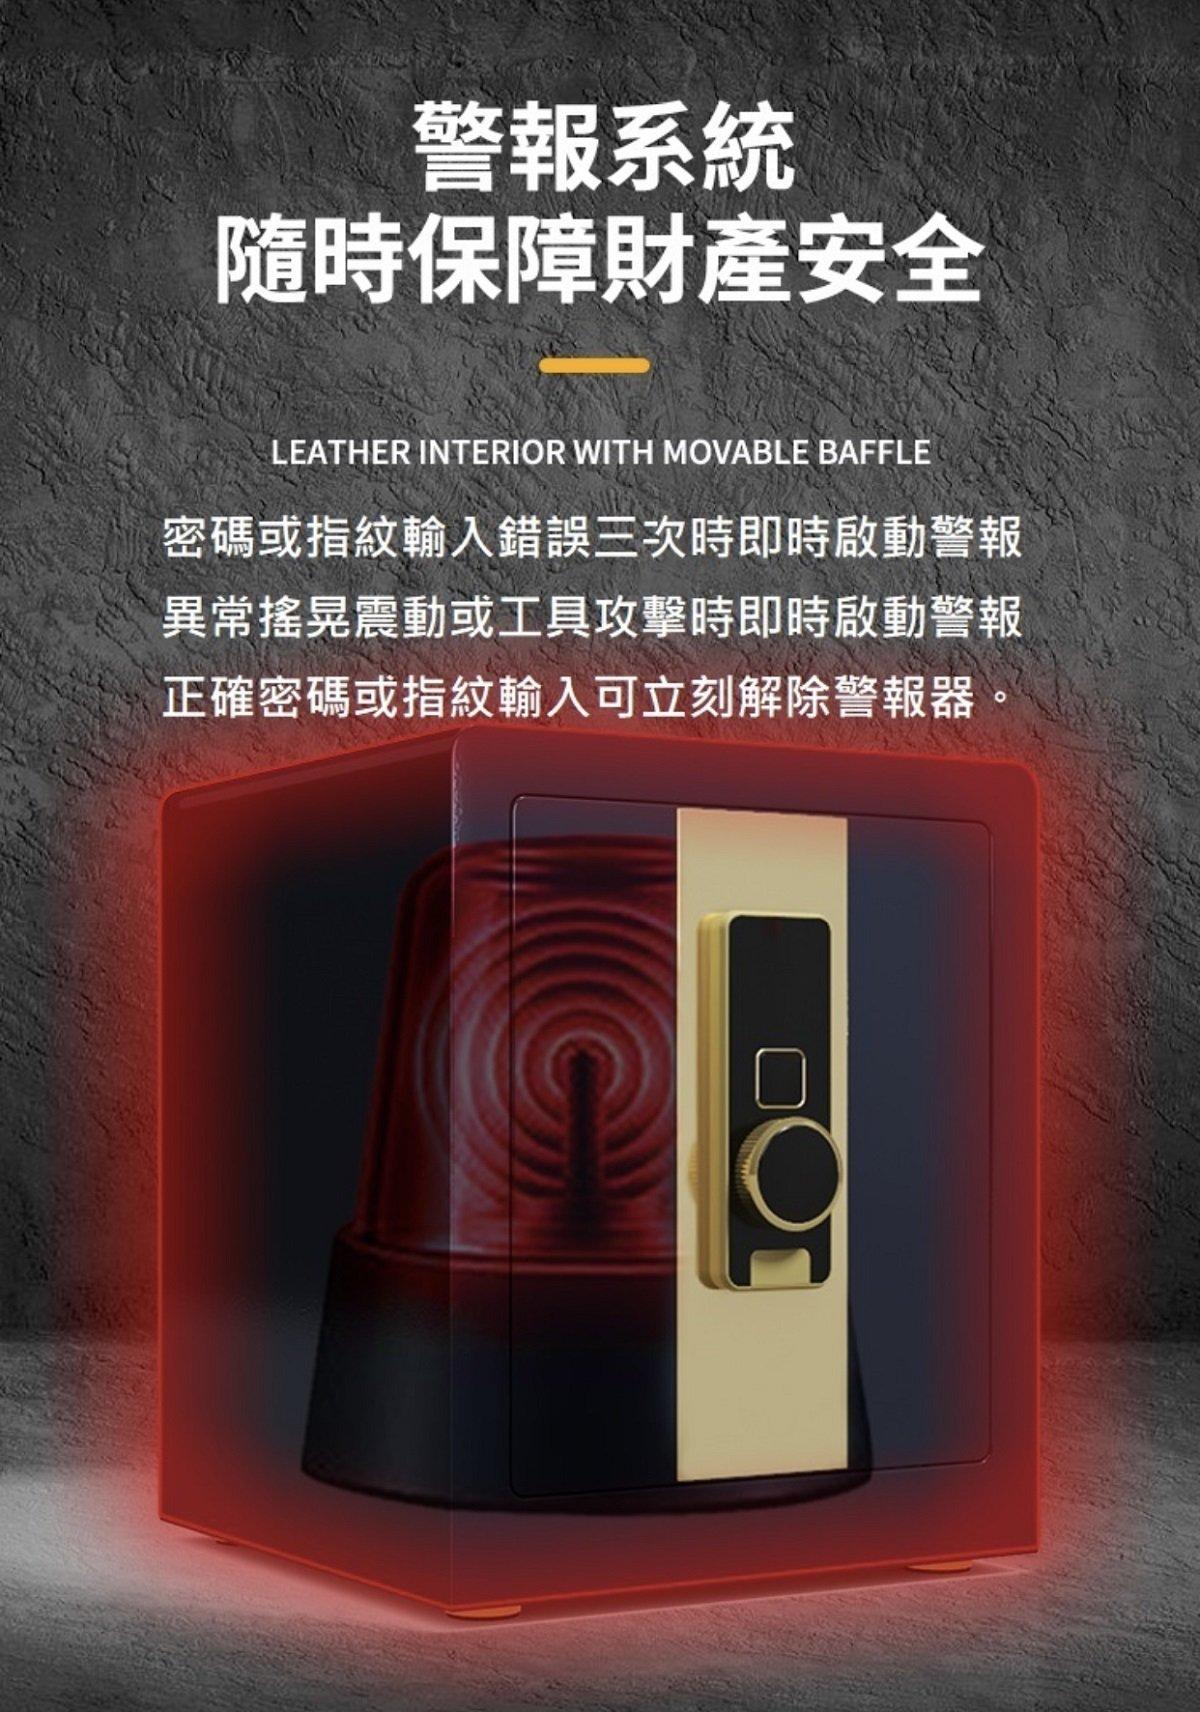 Marketing graphic-MB45-9